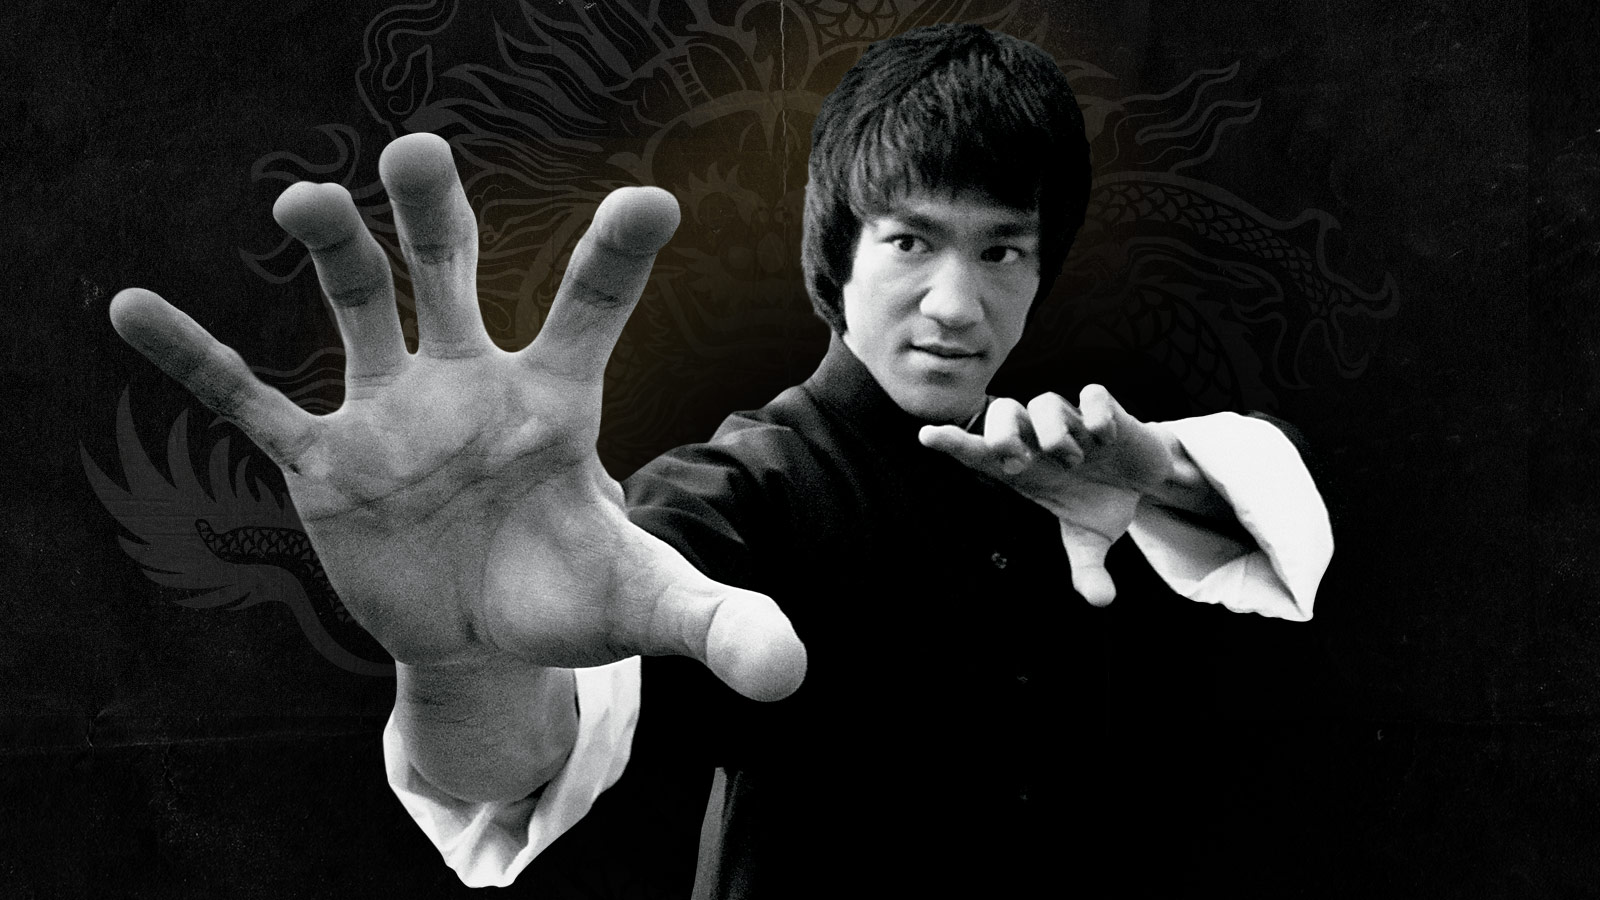 Bruce Lee networkokulu.net motivasyon sözleri 9